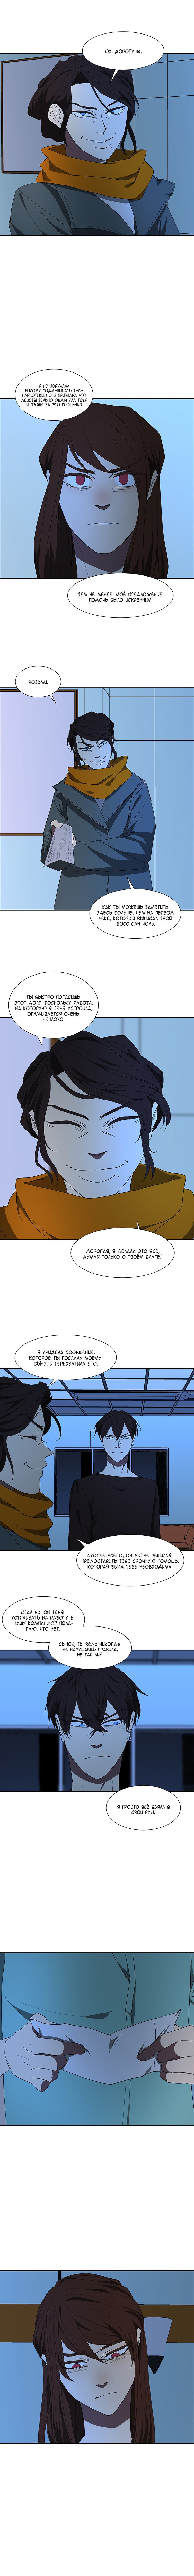 Манга Я люблю Ю / I love Yoo  - Том 1 Глава 66 Страница 8